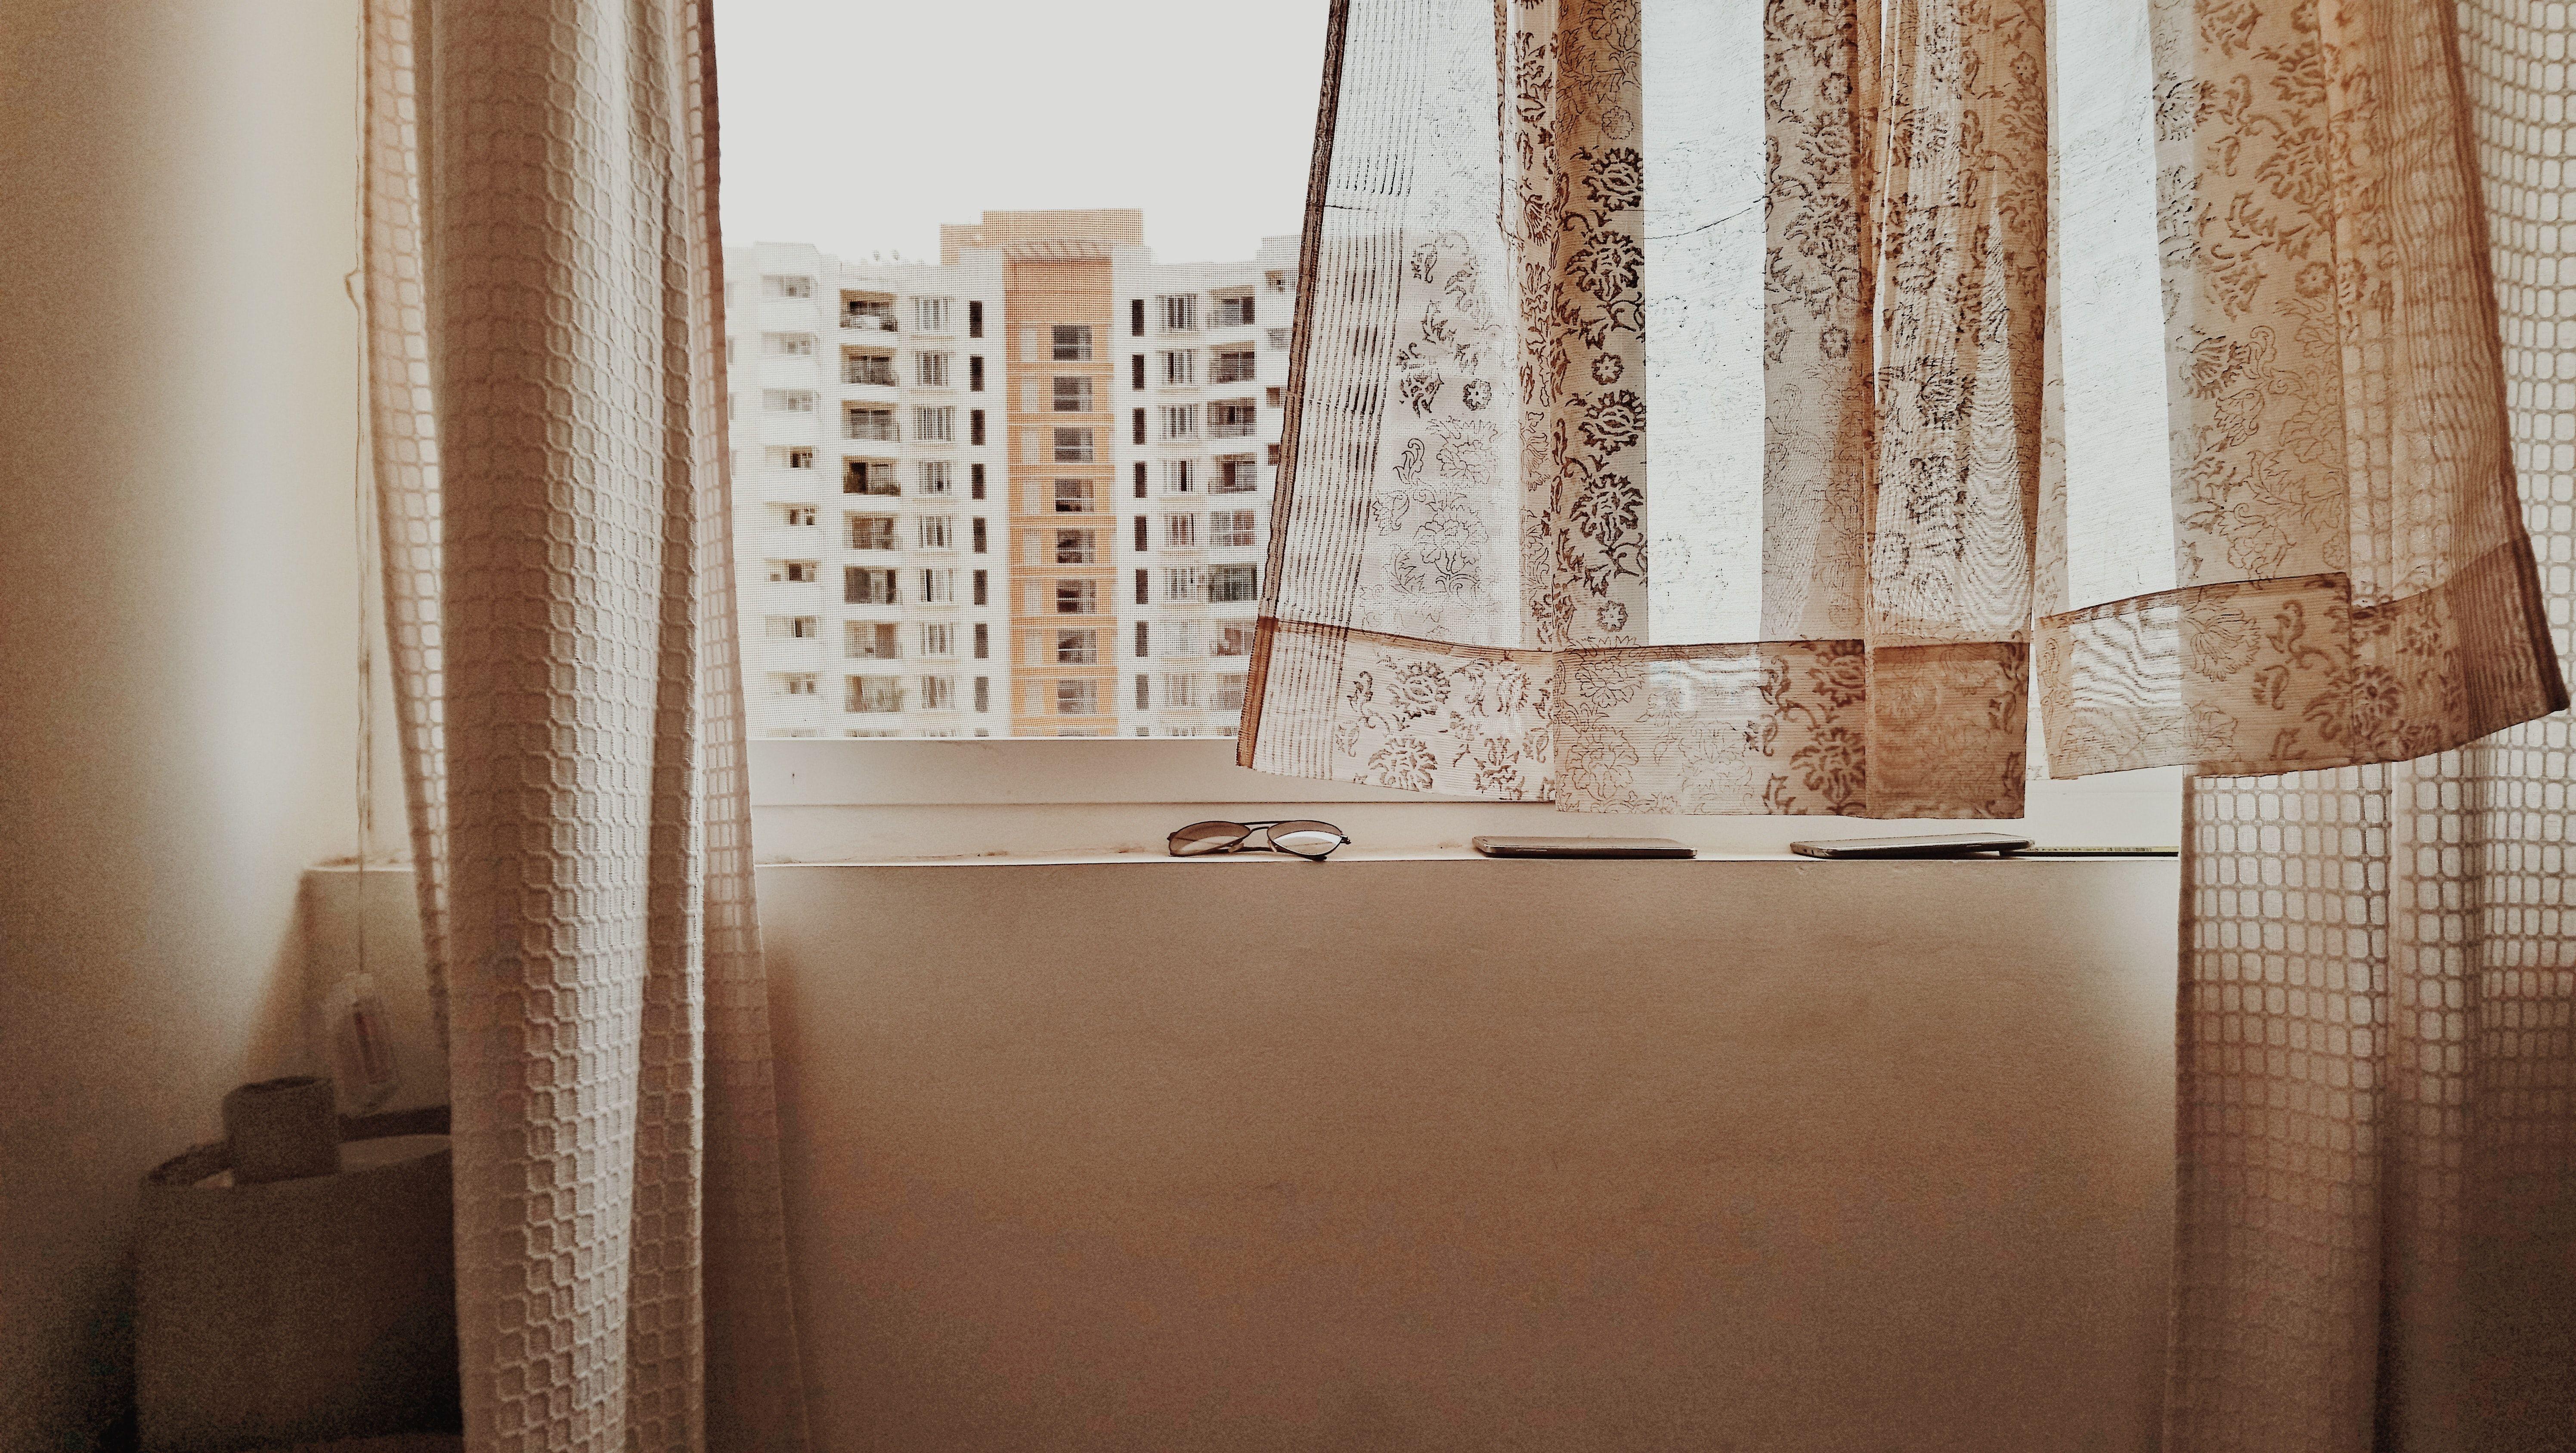 Handpicked brown car images and. Desktop Beige Aesthetic Wallpapers - Wallpaper Cave